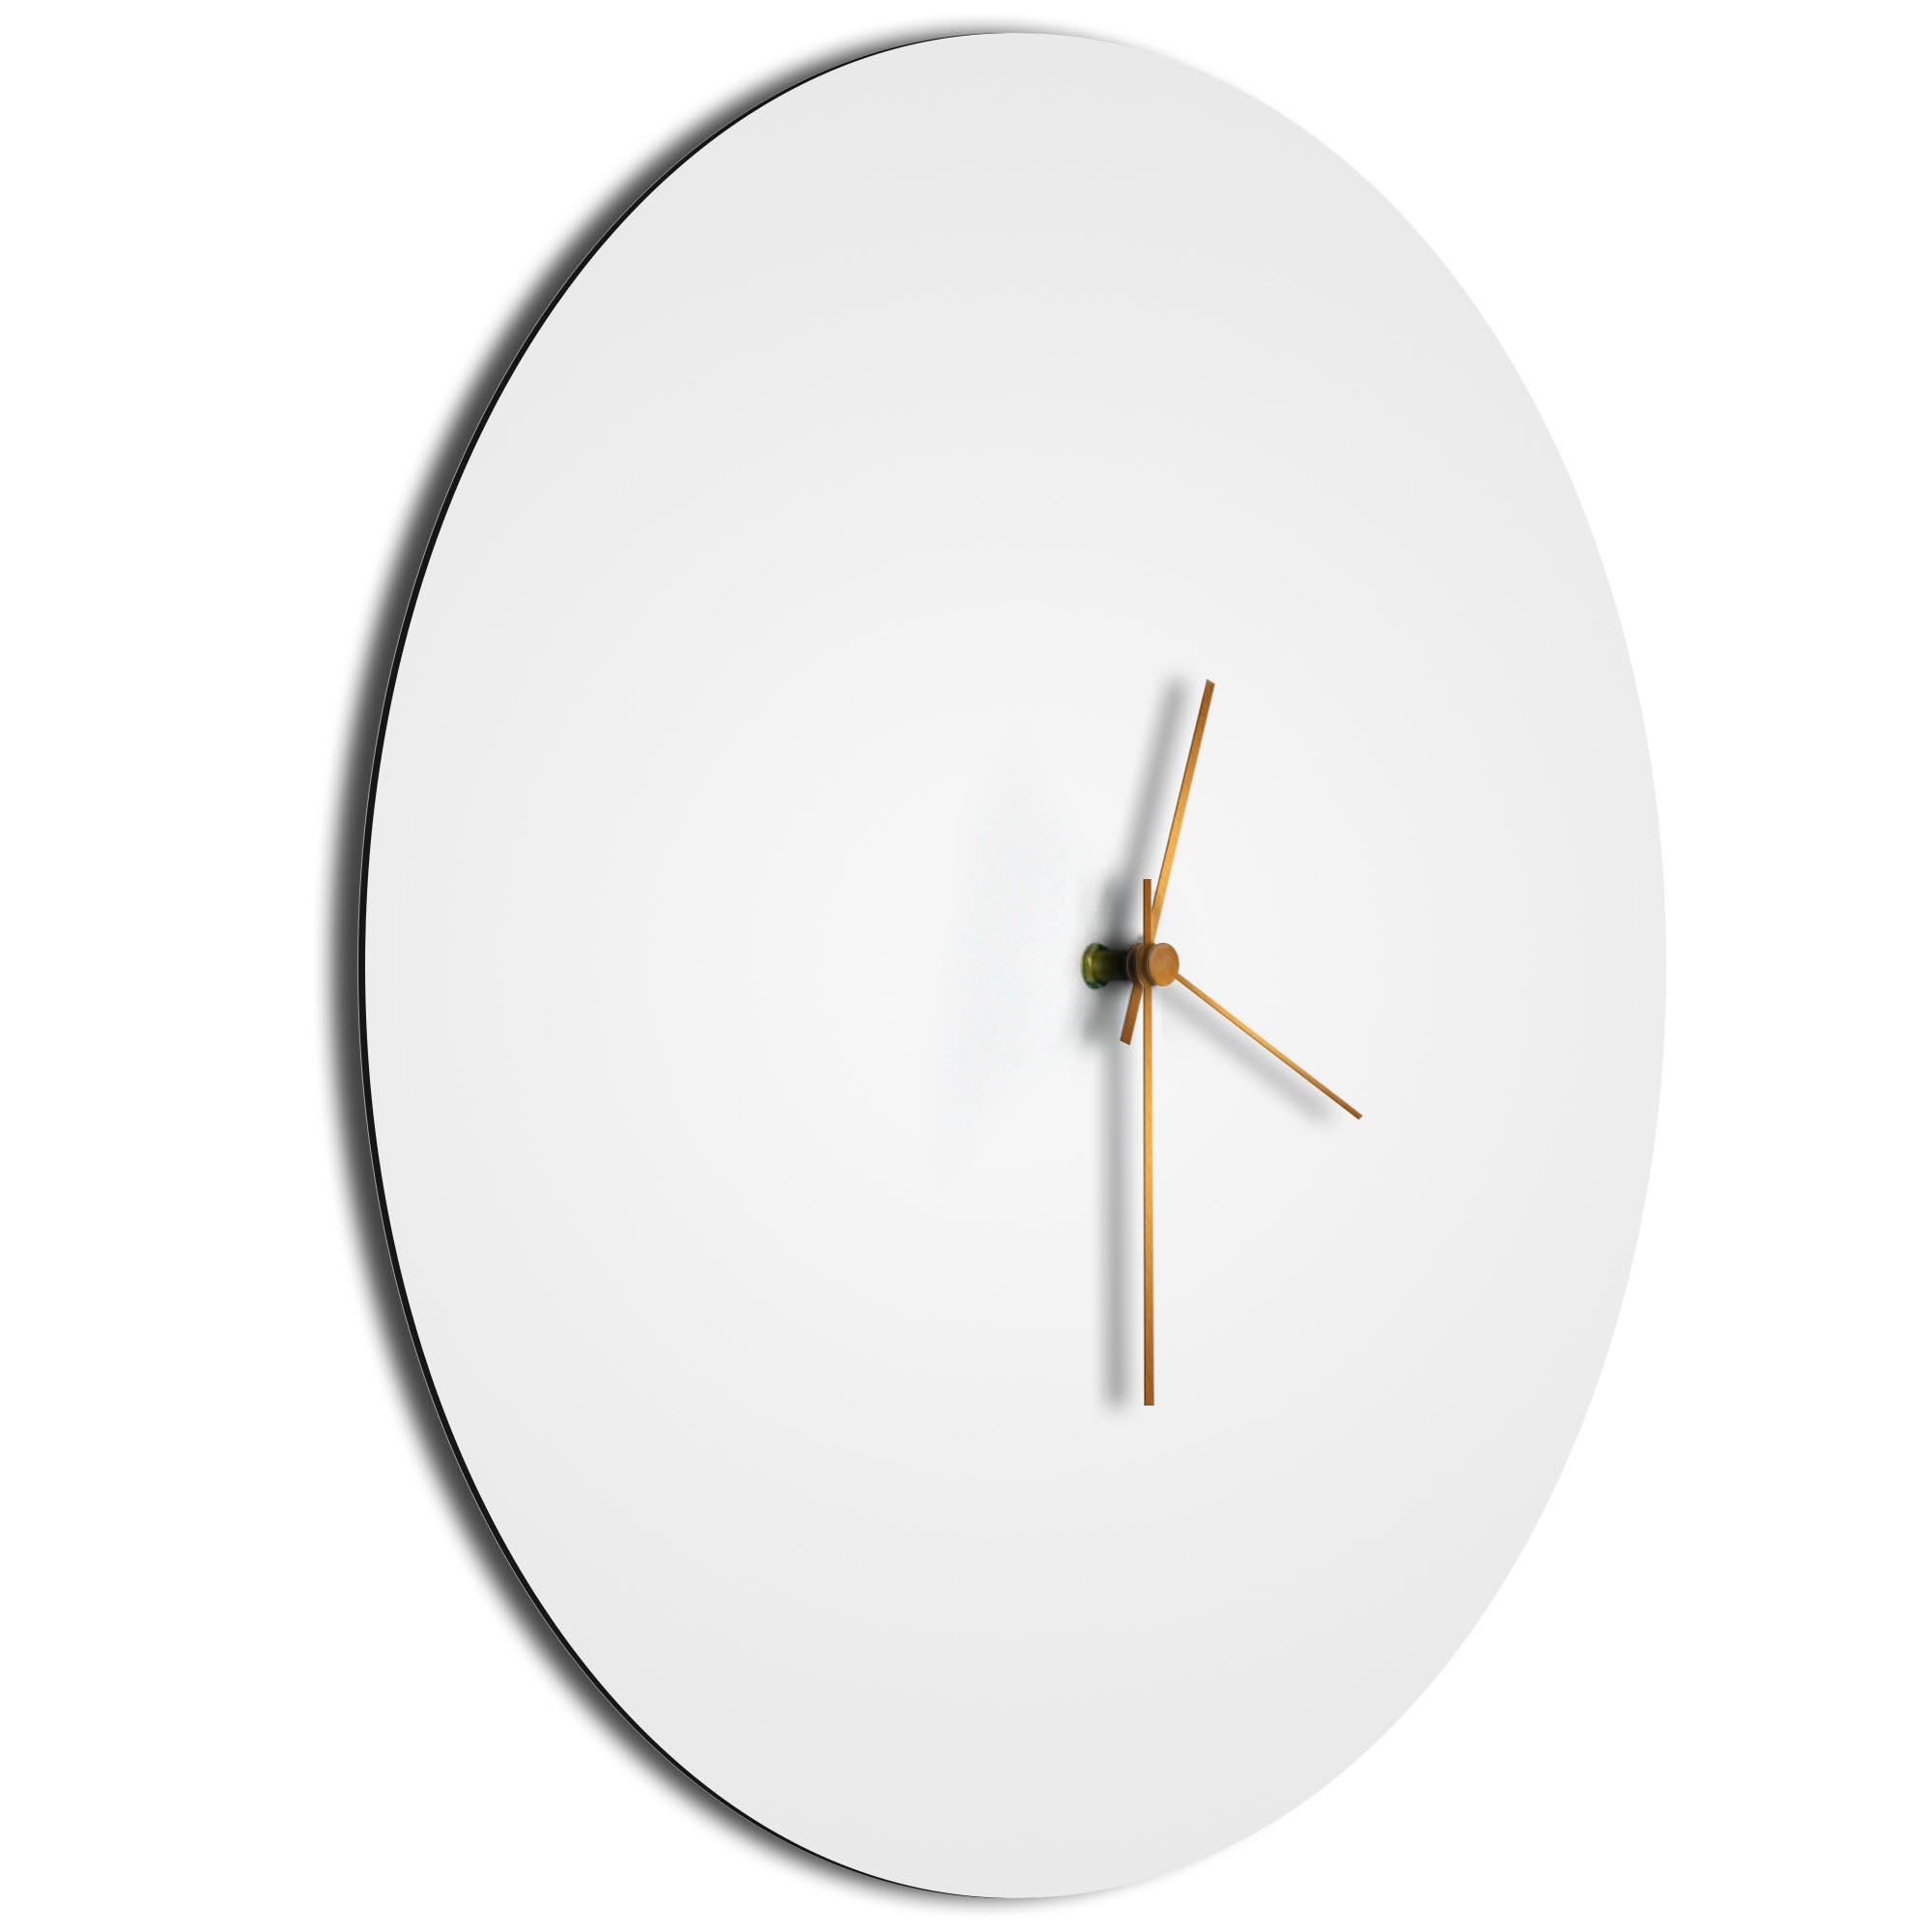 Whiteout Bronze Circle Clock - Image 2